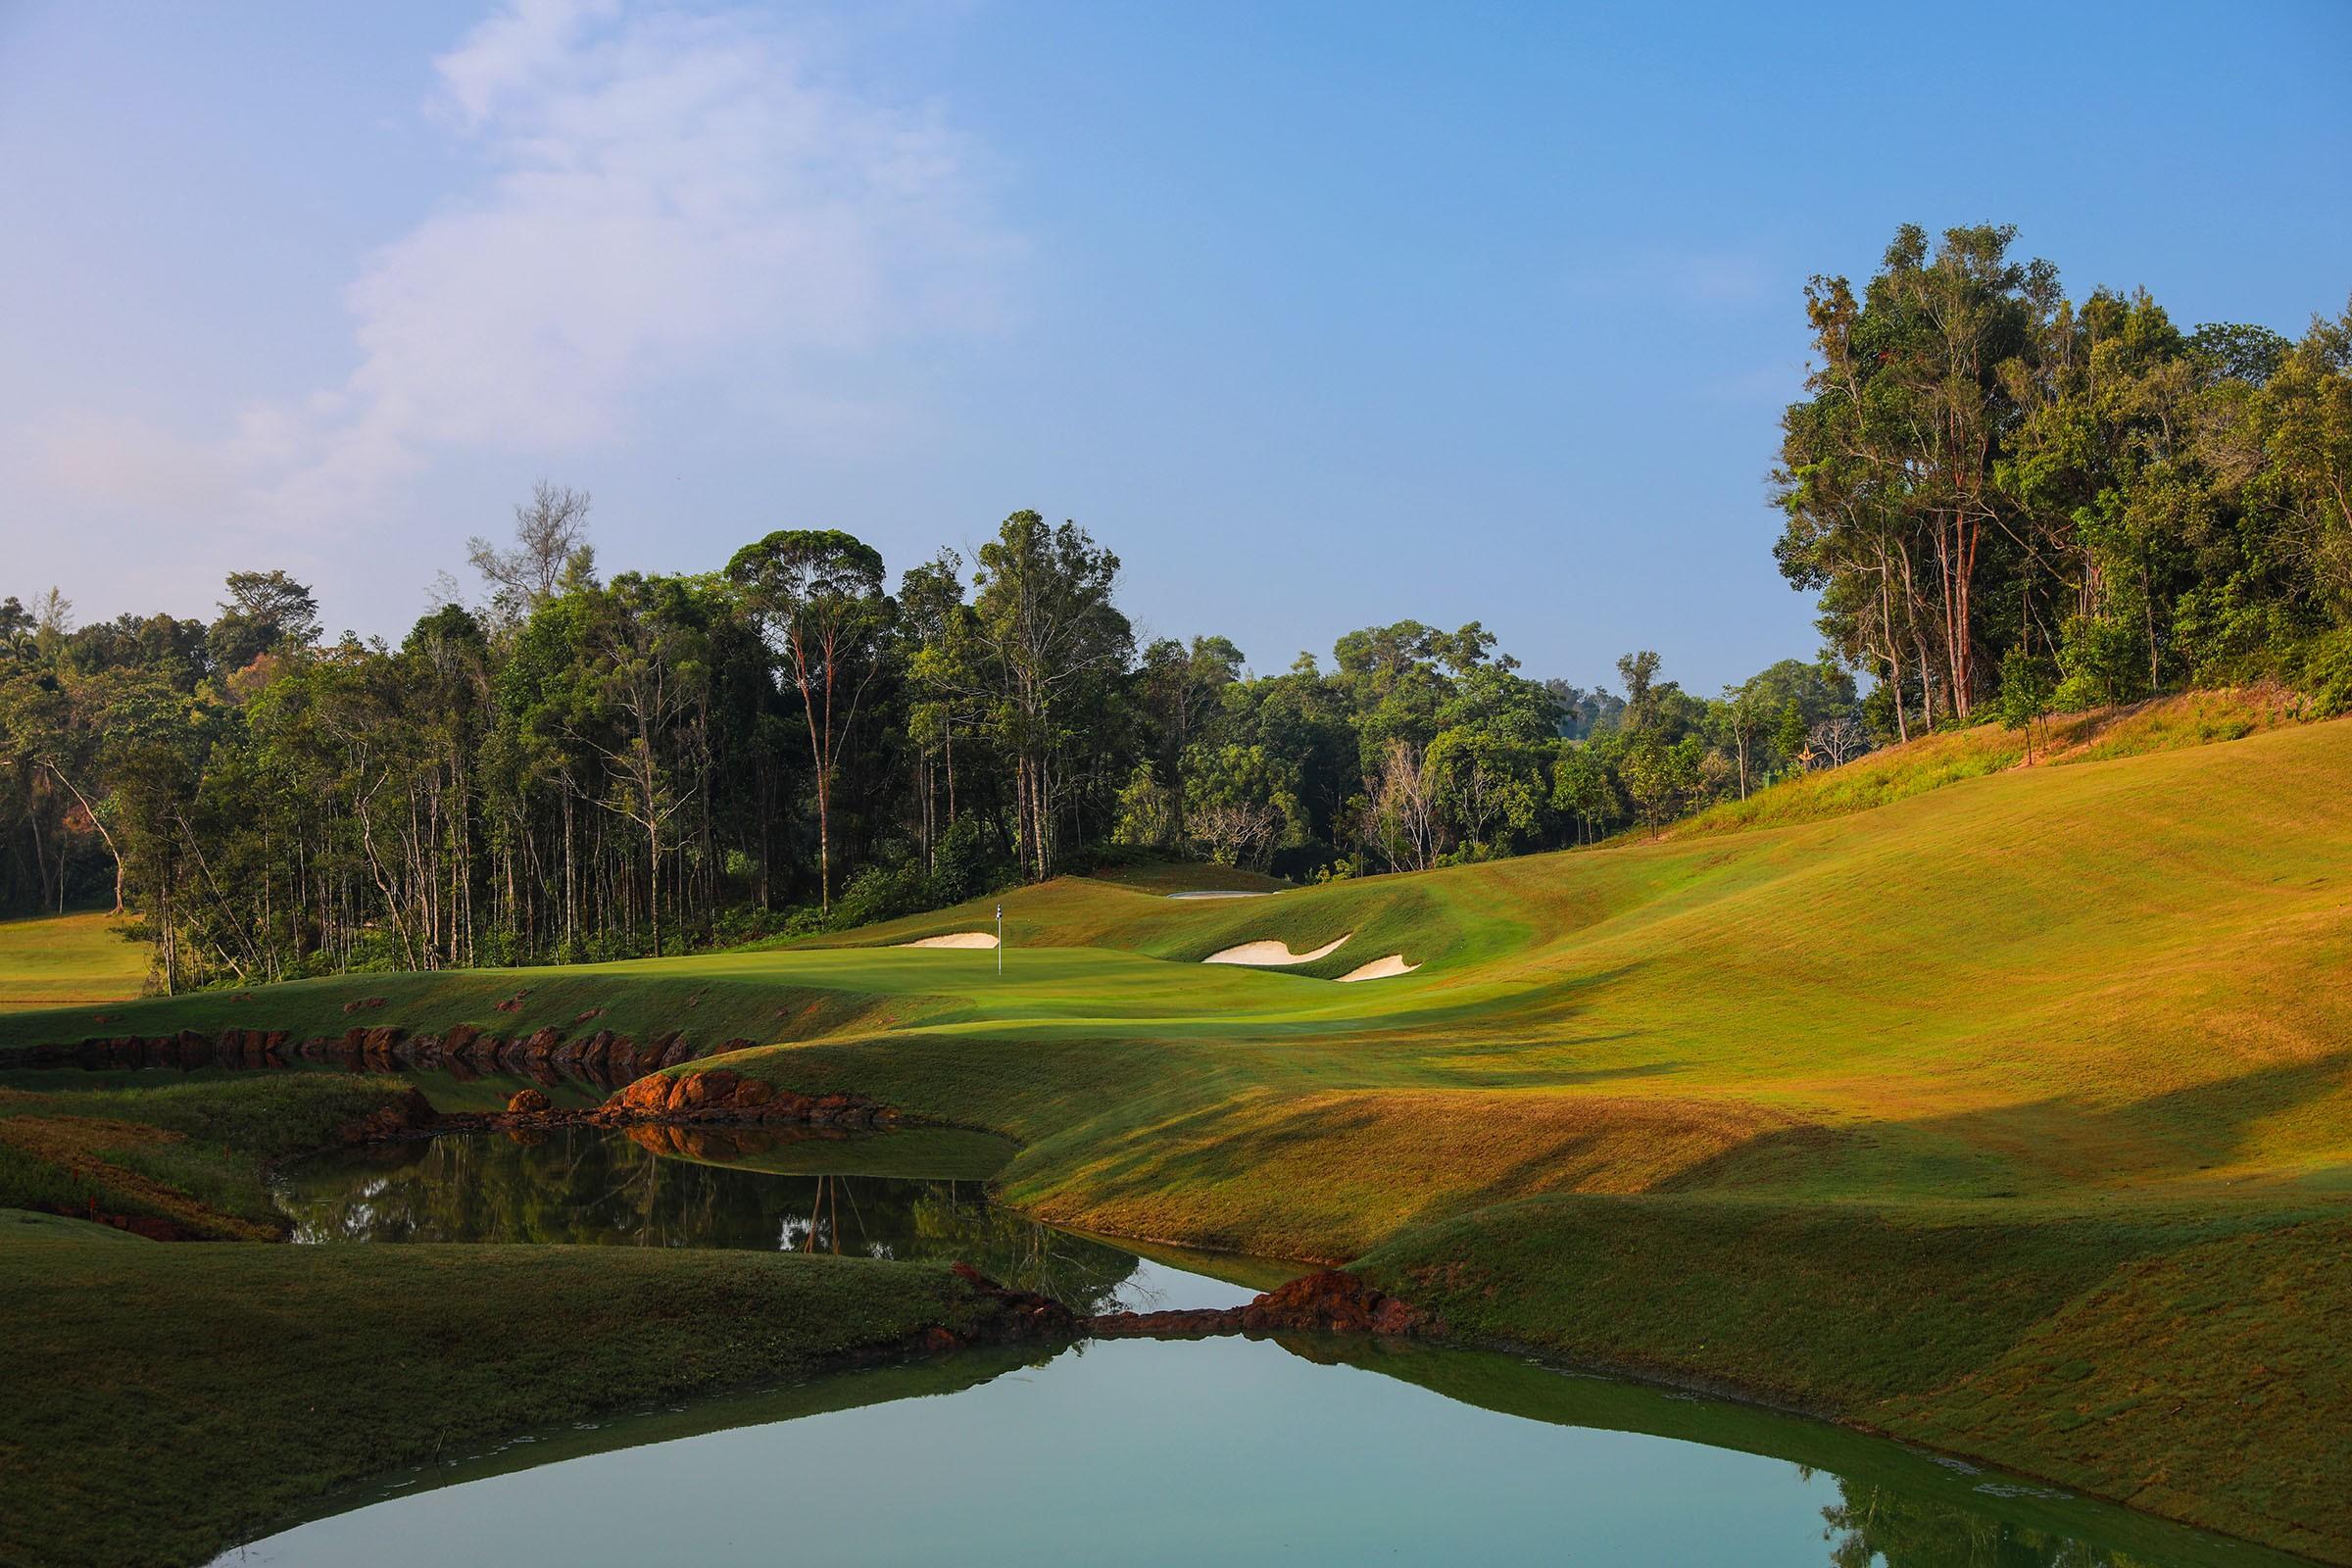 Wagi Johor, Malezija 5* - 8 dni/ 7 noči, 5x green fee